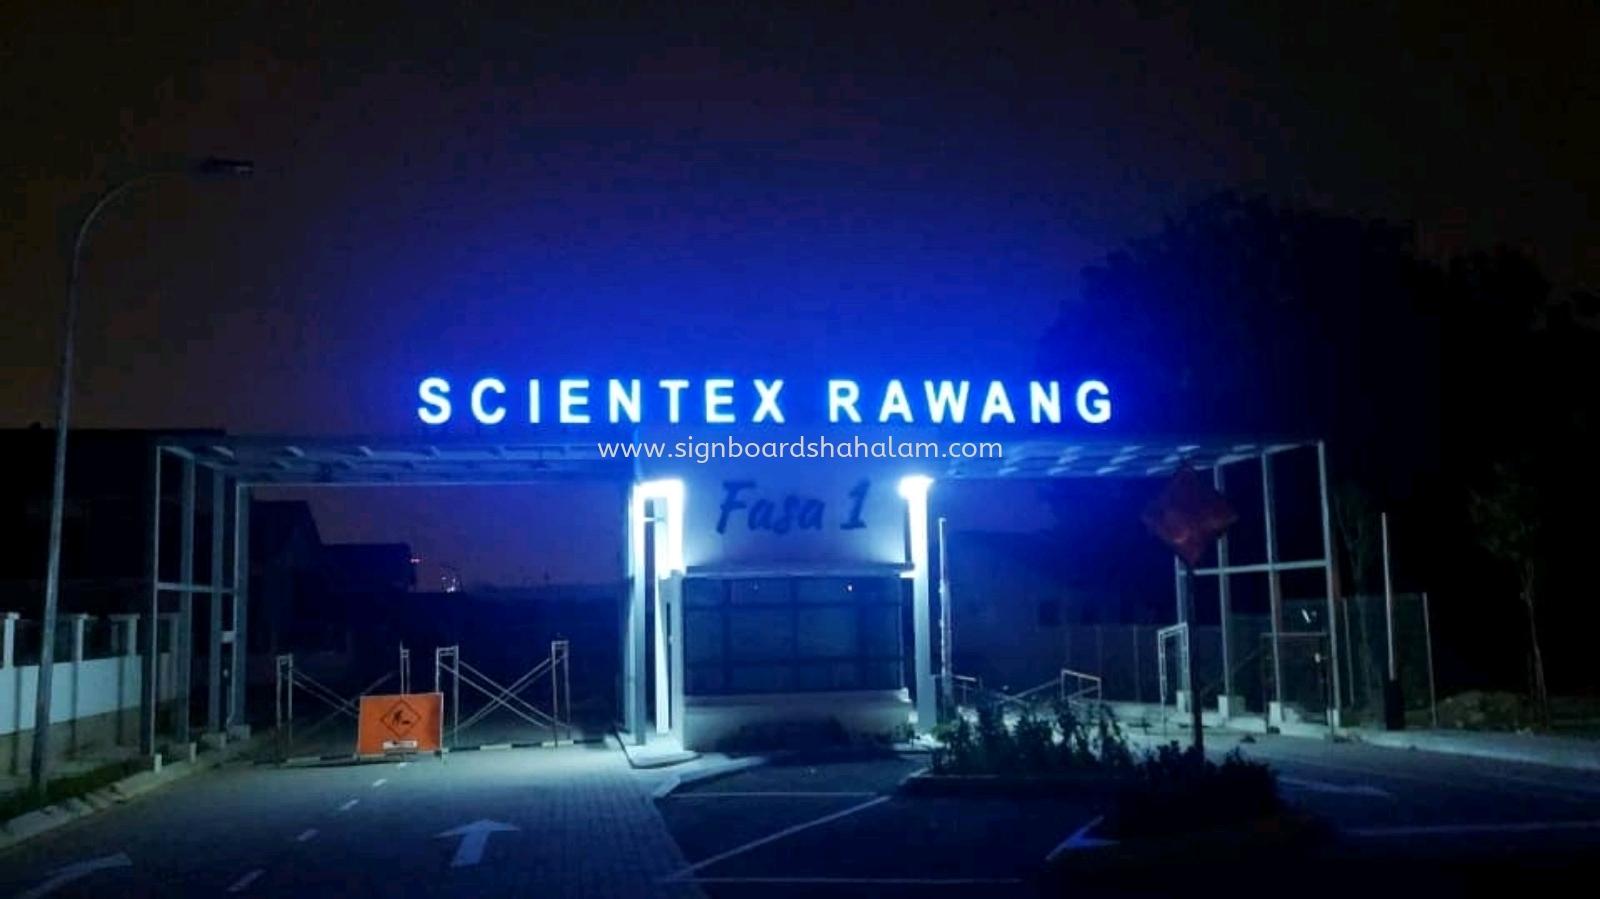 Signboard Scientex Rawang, Papan Iklan 3D Led, Night View